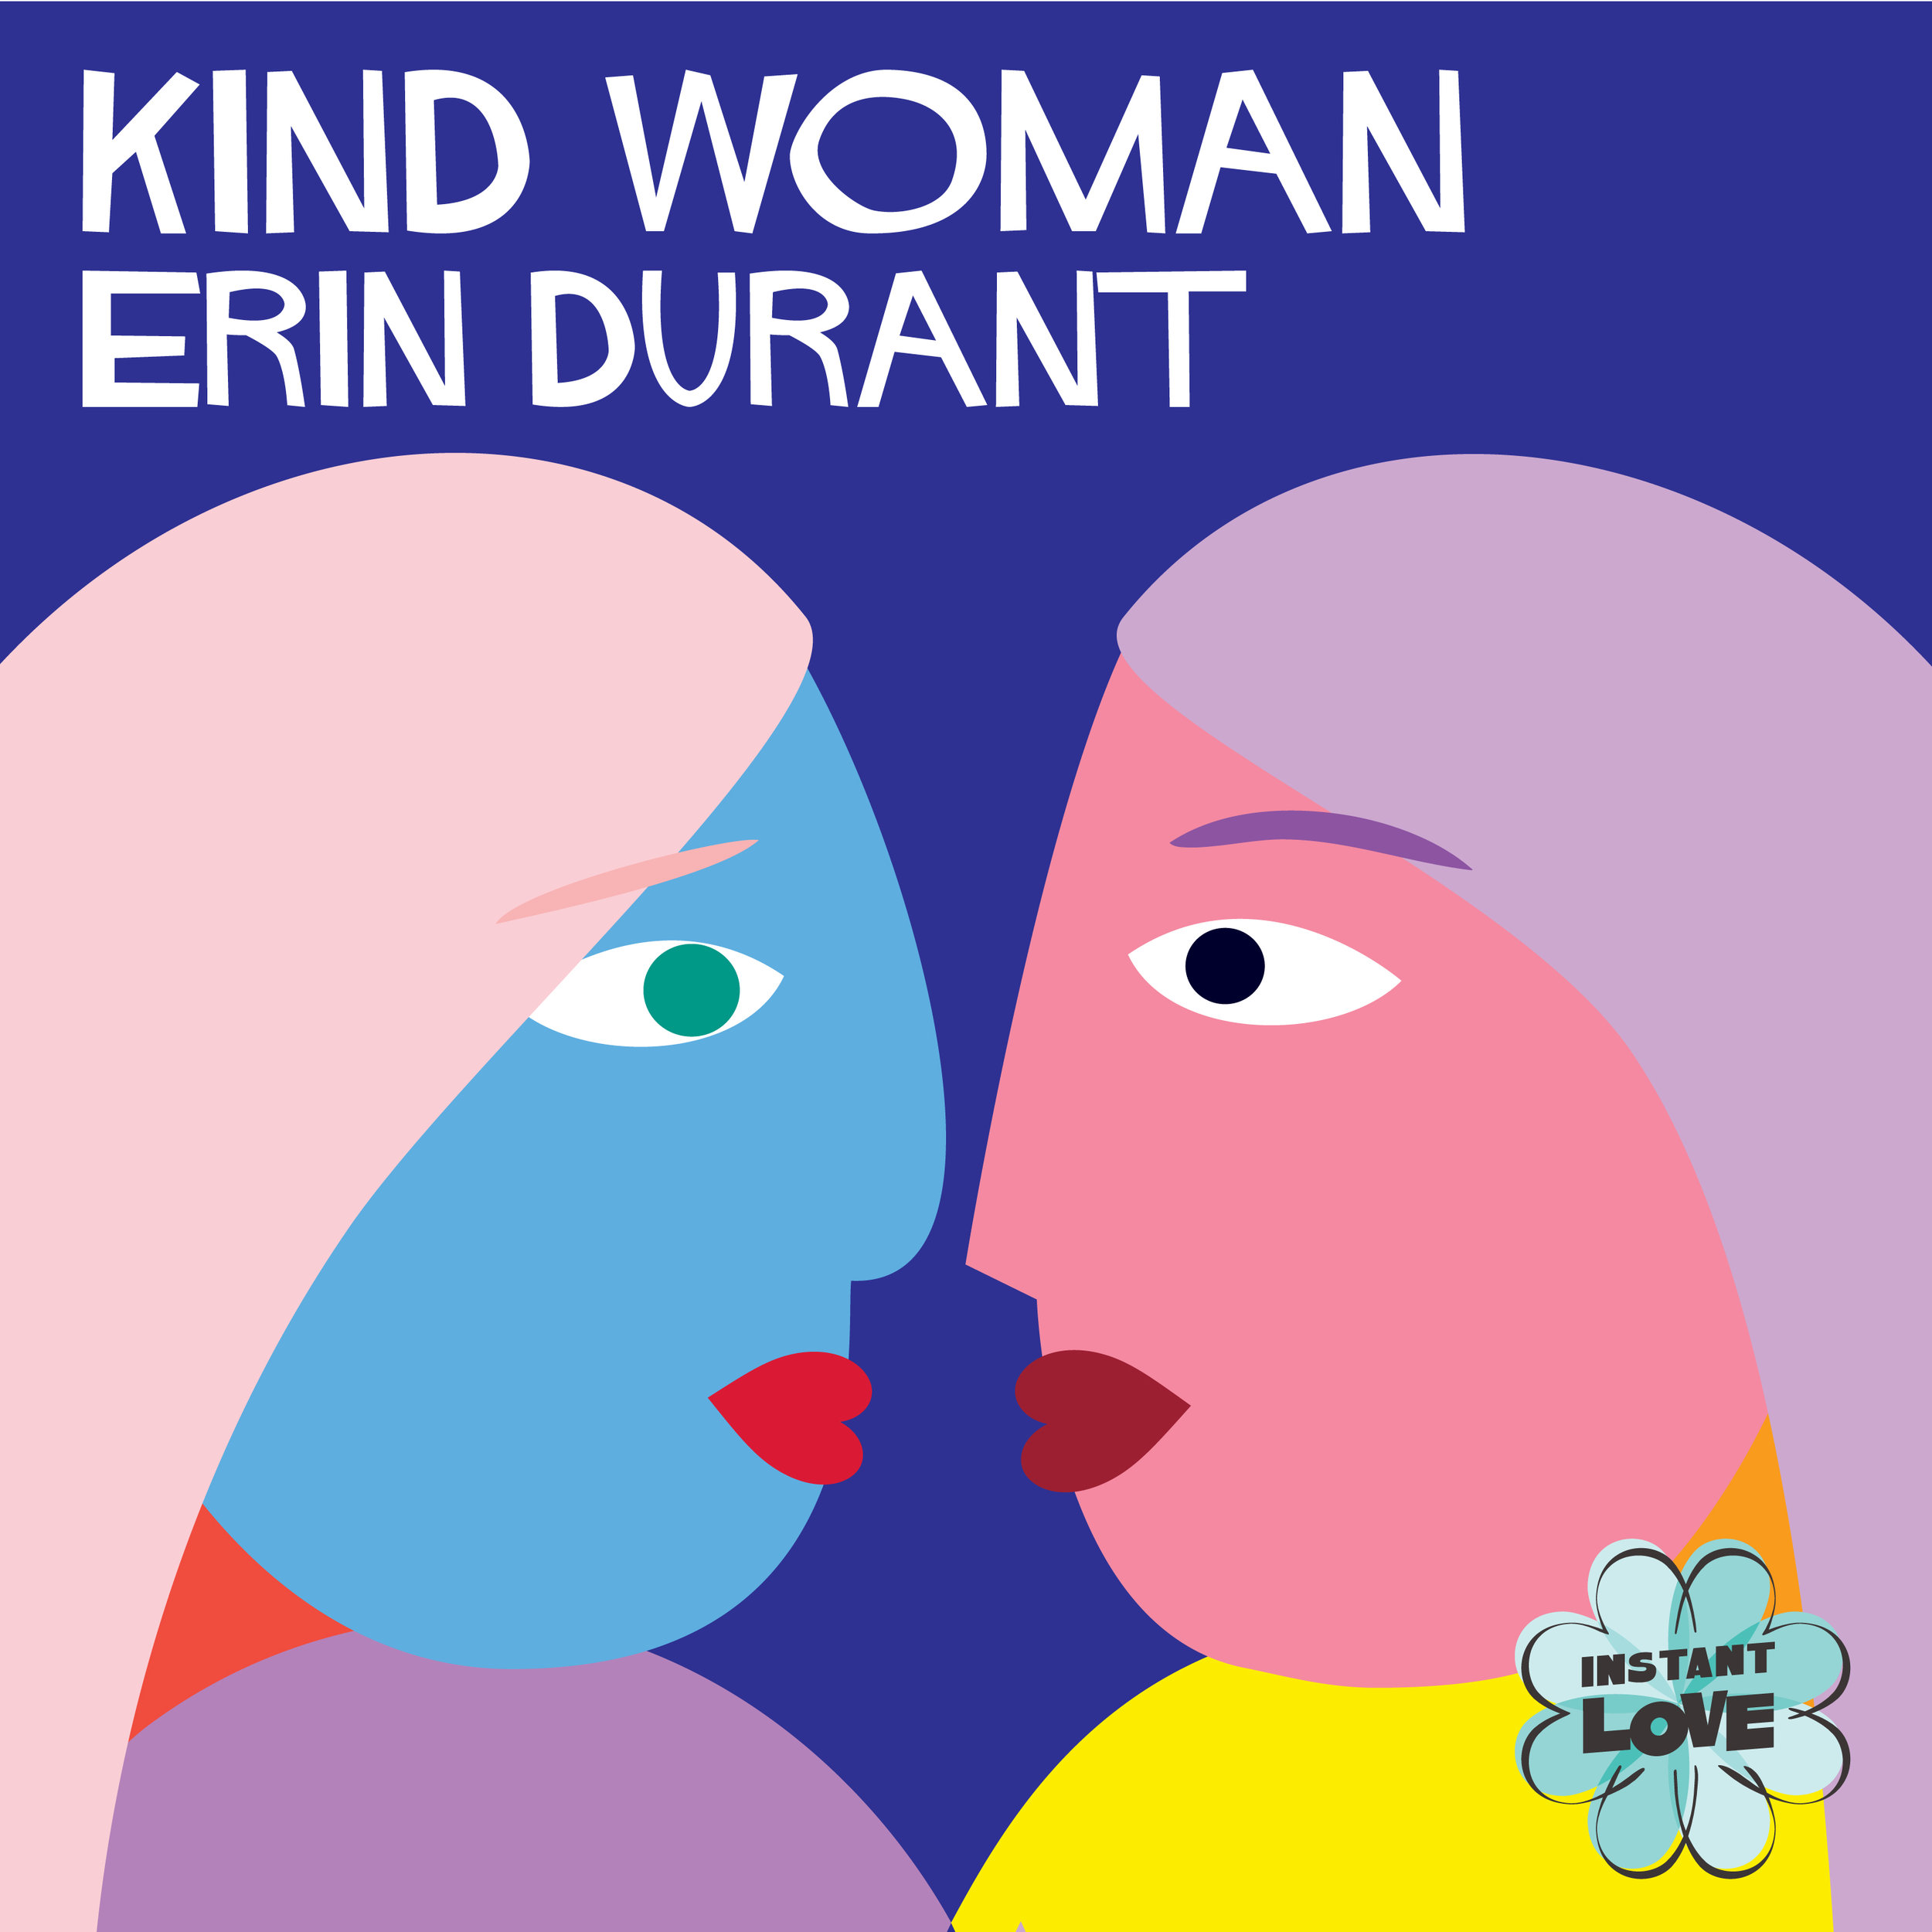 Instant-Love_Kind-Woman_FNL_2-14-17.jpg